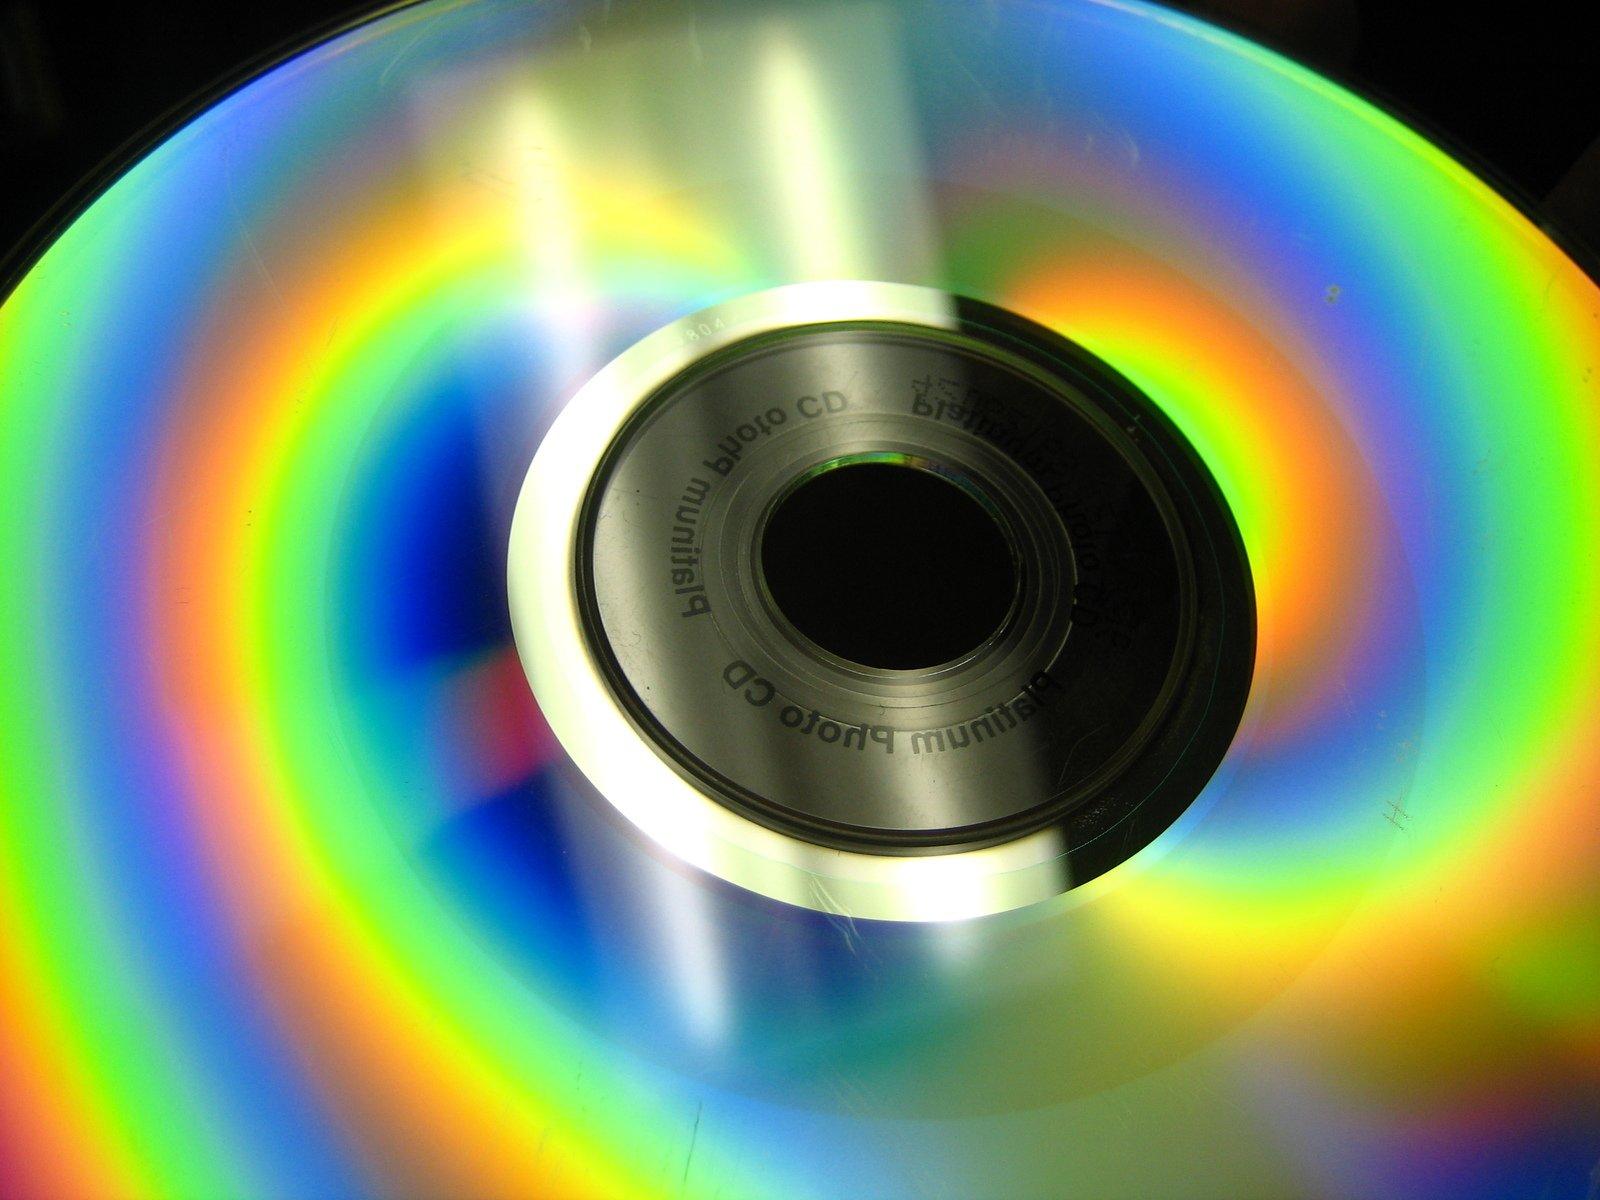 Electric CD